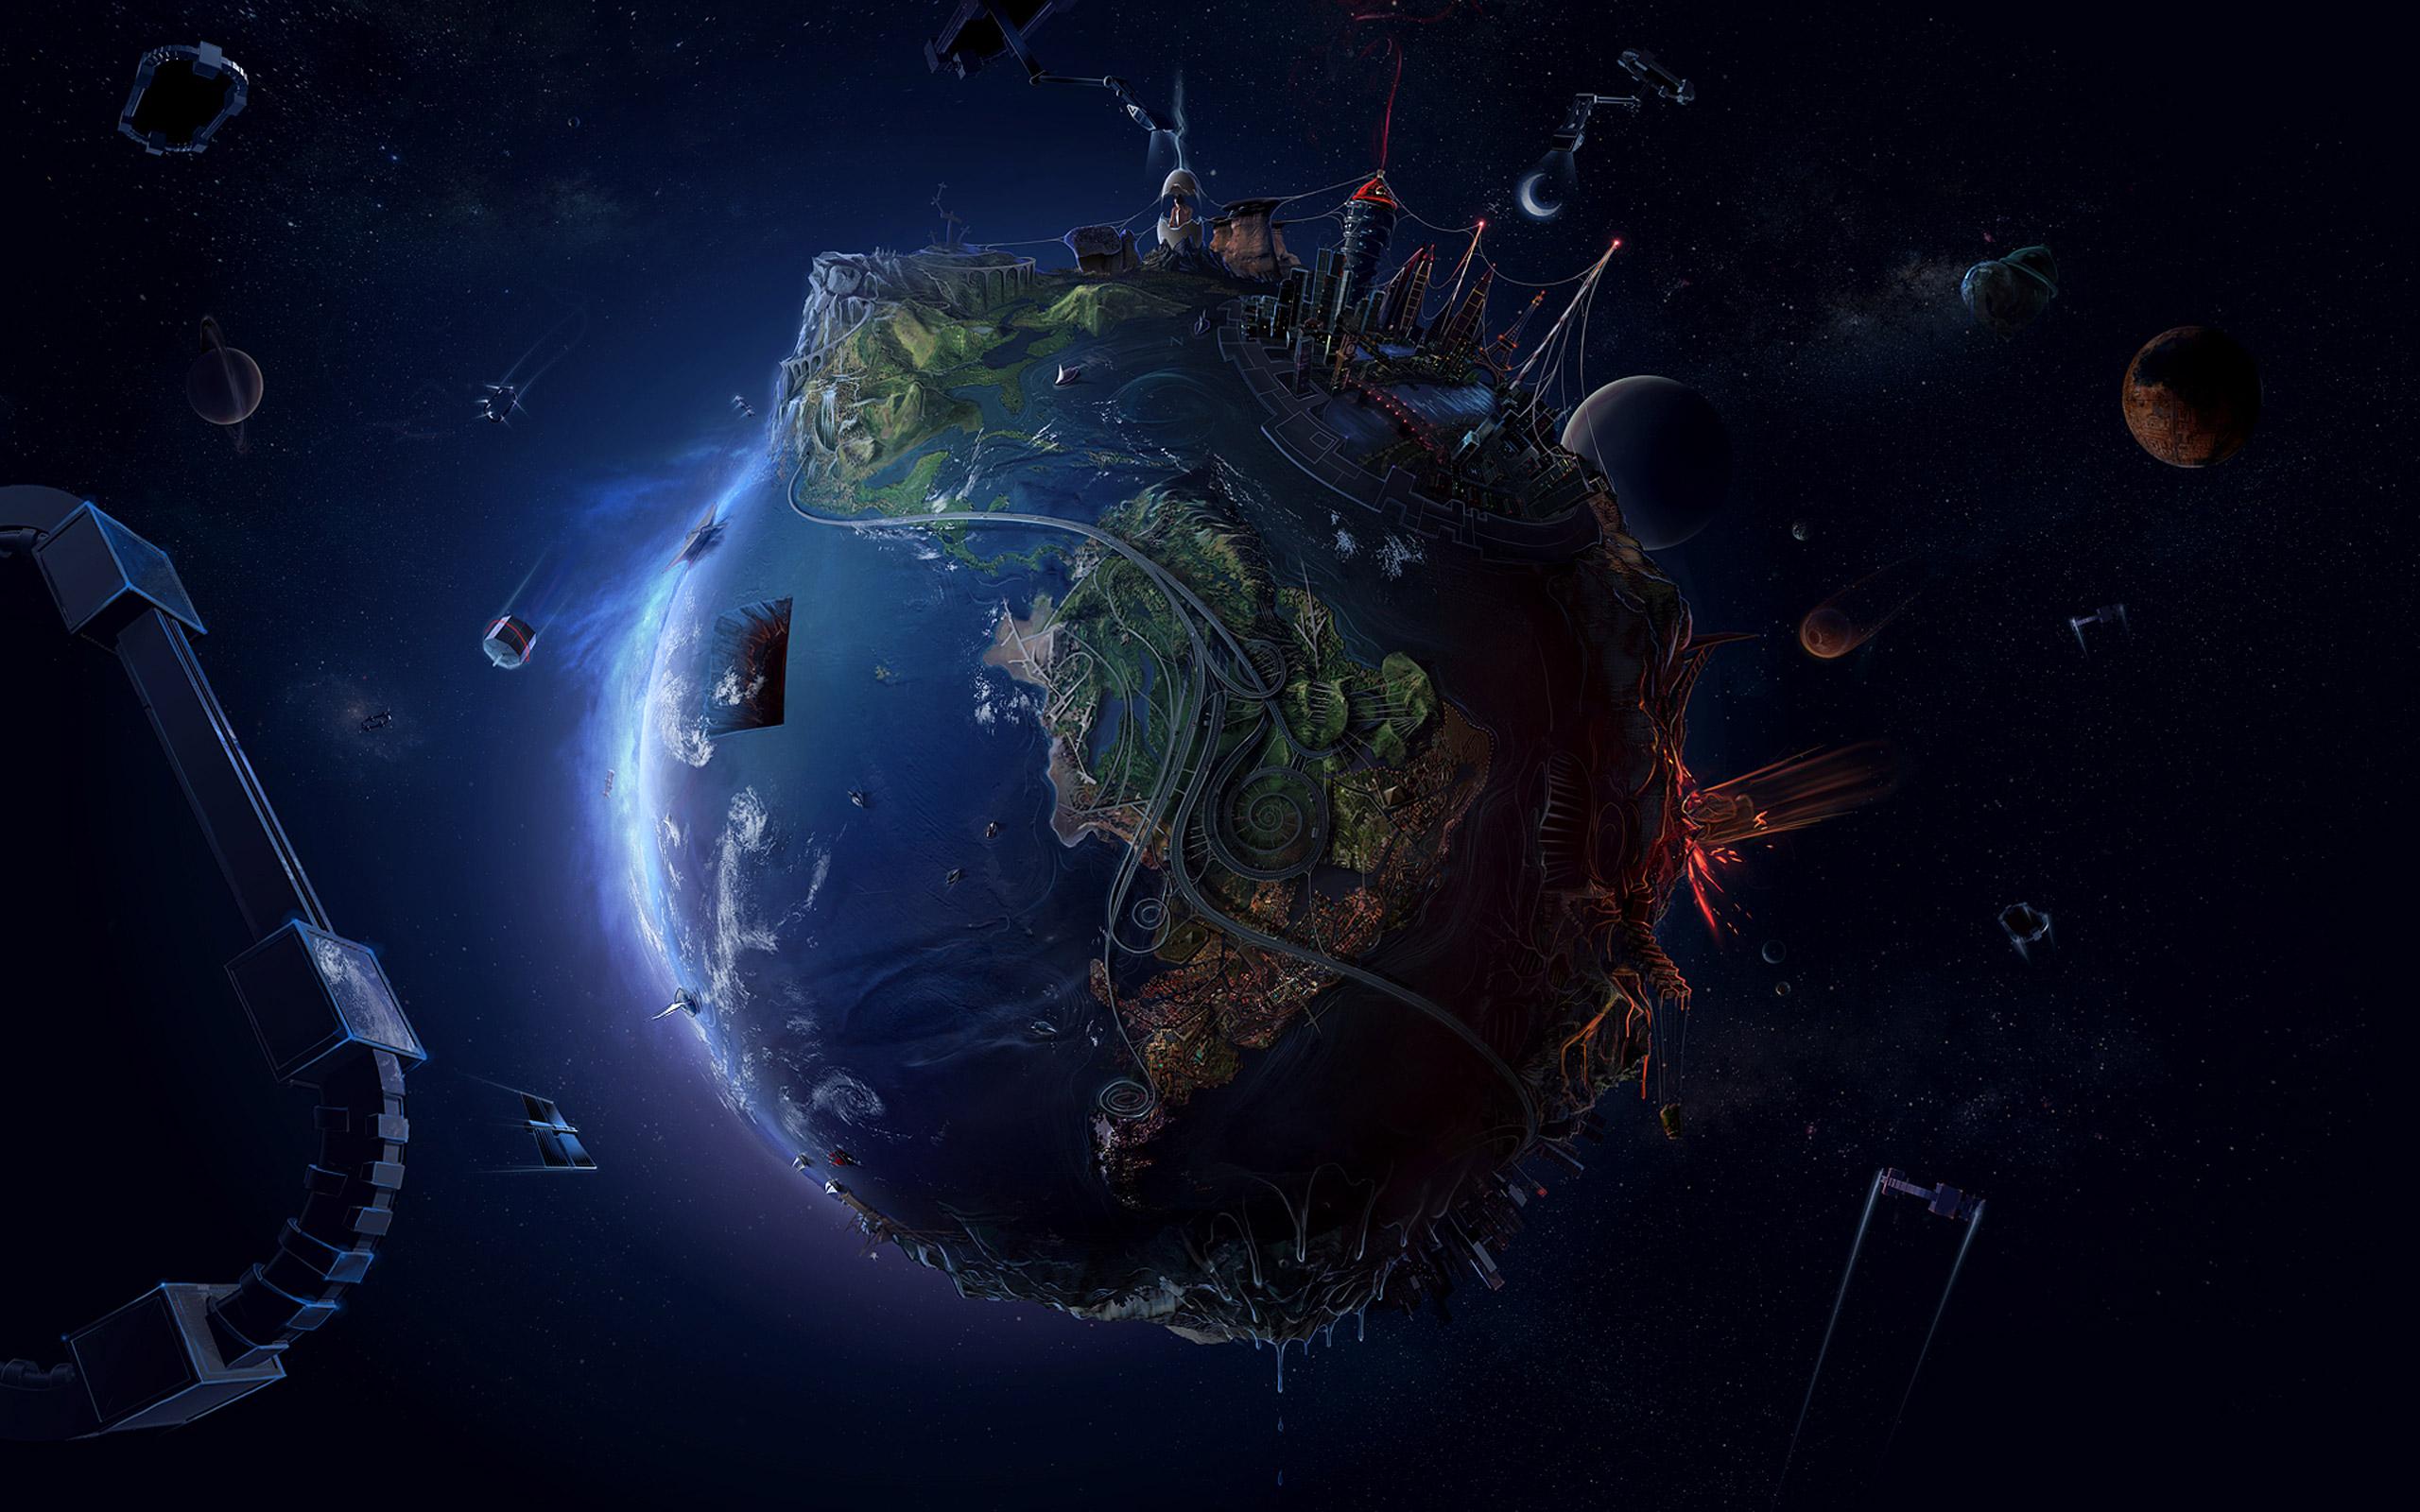 marketing earth hd wallpapers - photo #43